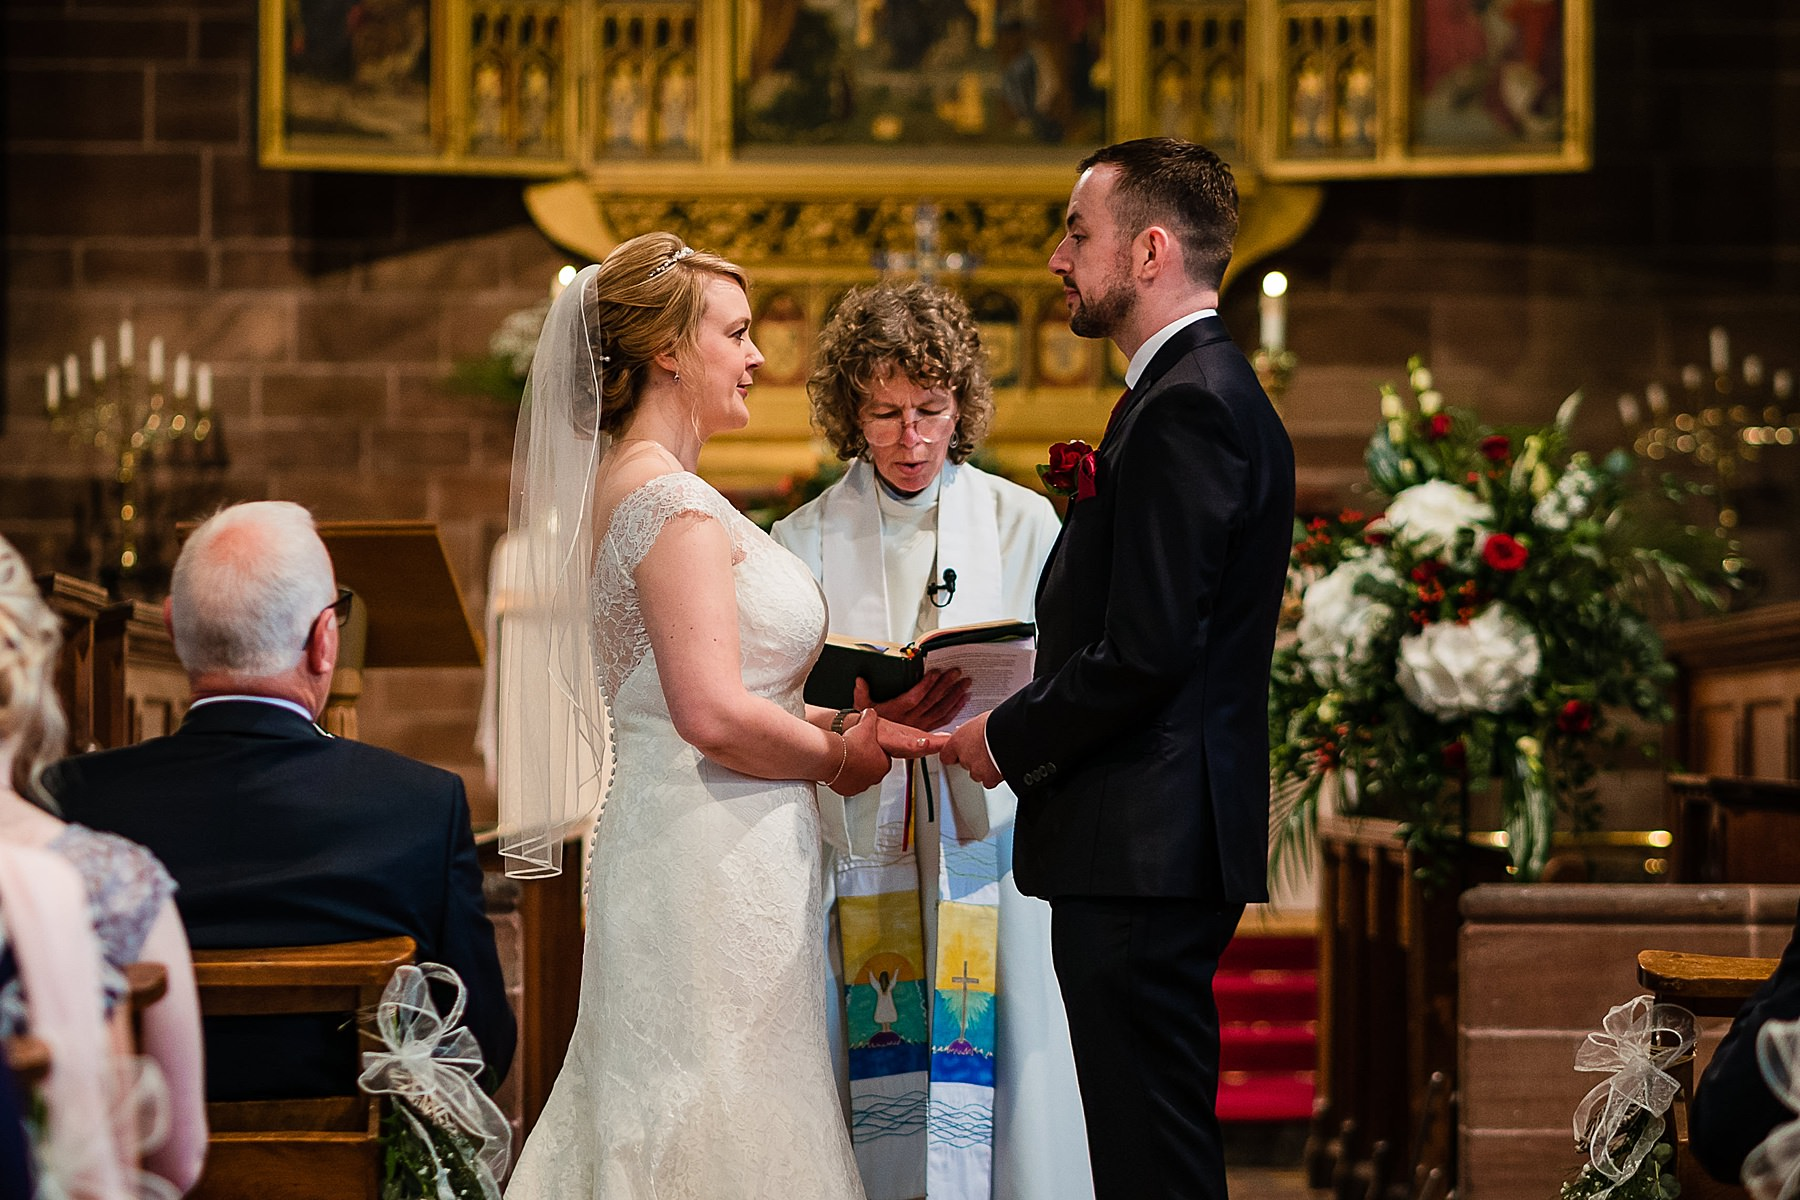 st swithuns wedding ceremony